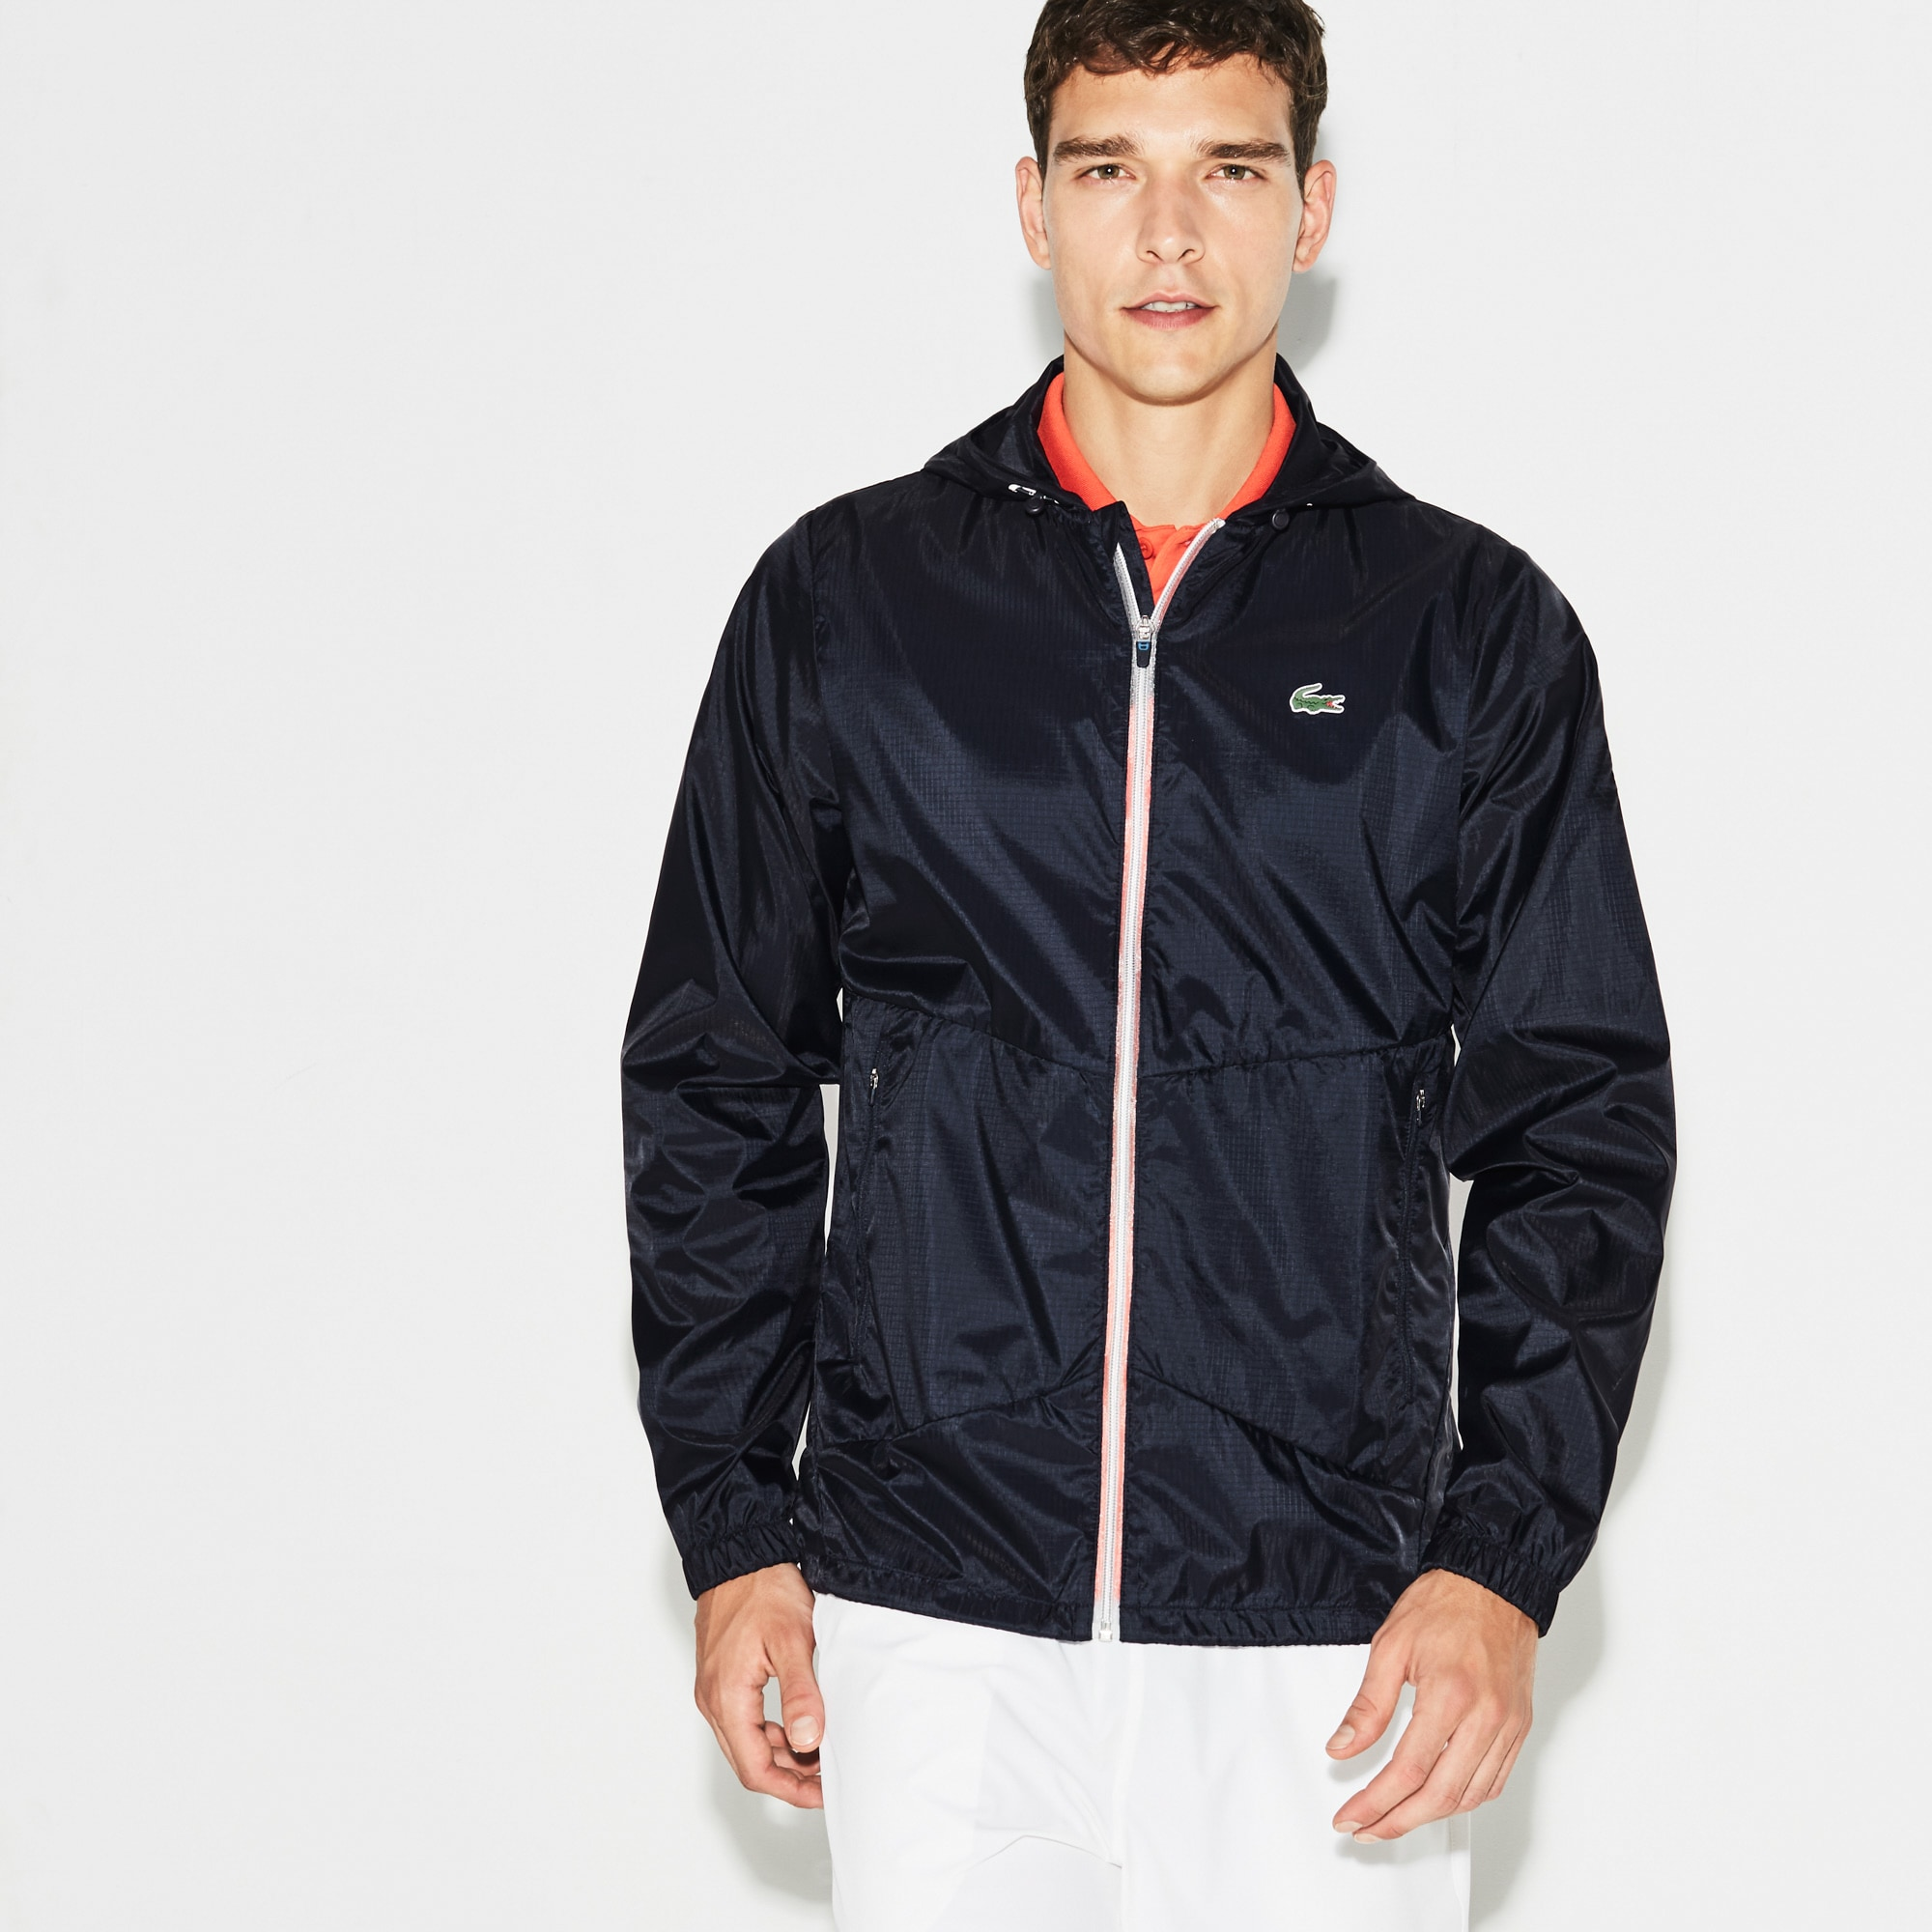 Men's Jacket Lacoste x Novak Djokovic - Exclusive Edition